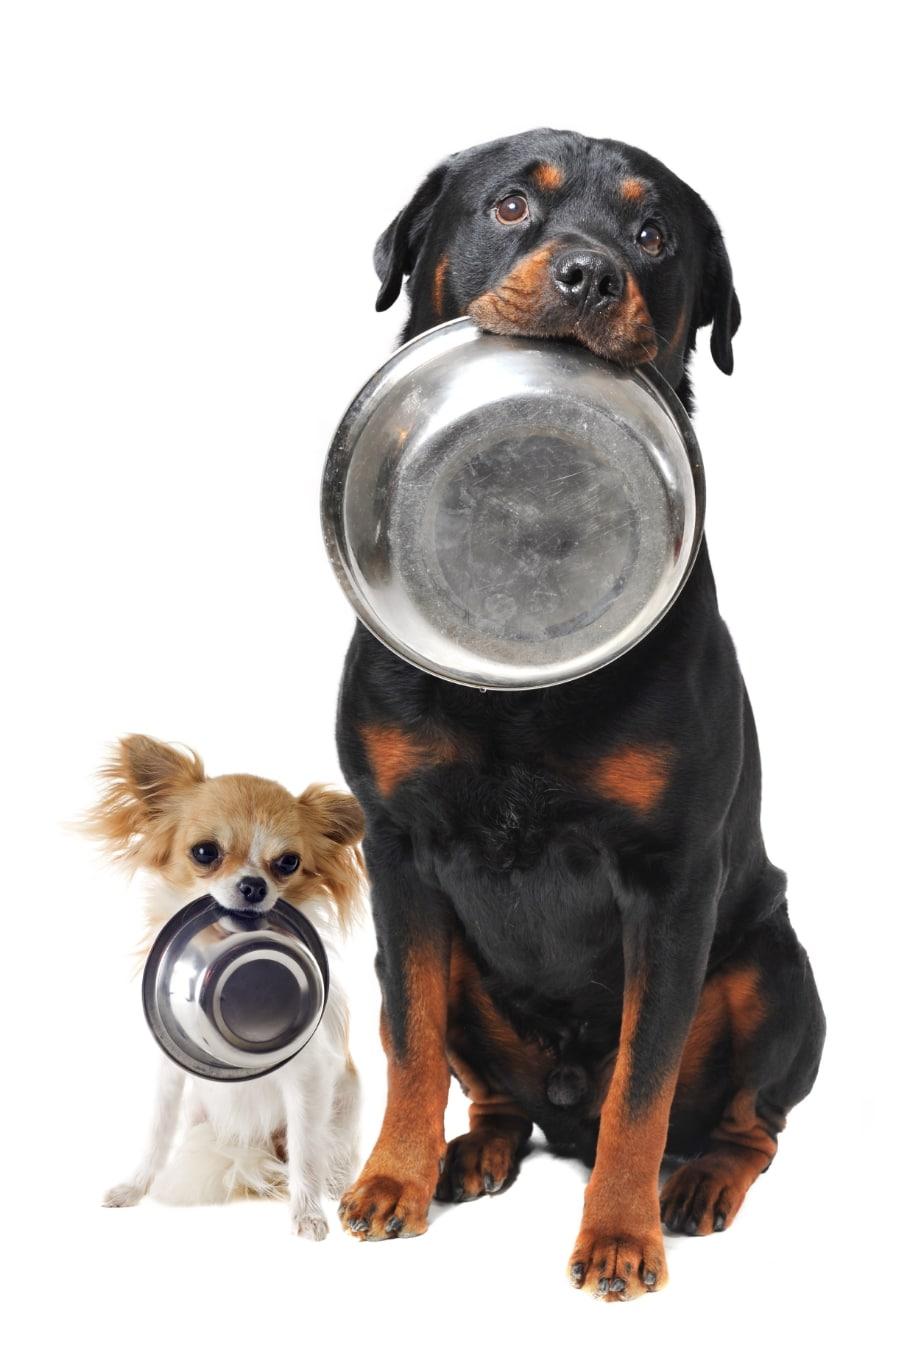 dog_arthritis_and_food-025372-edited